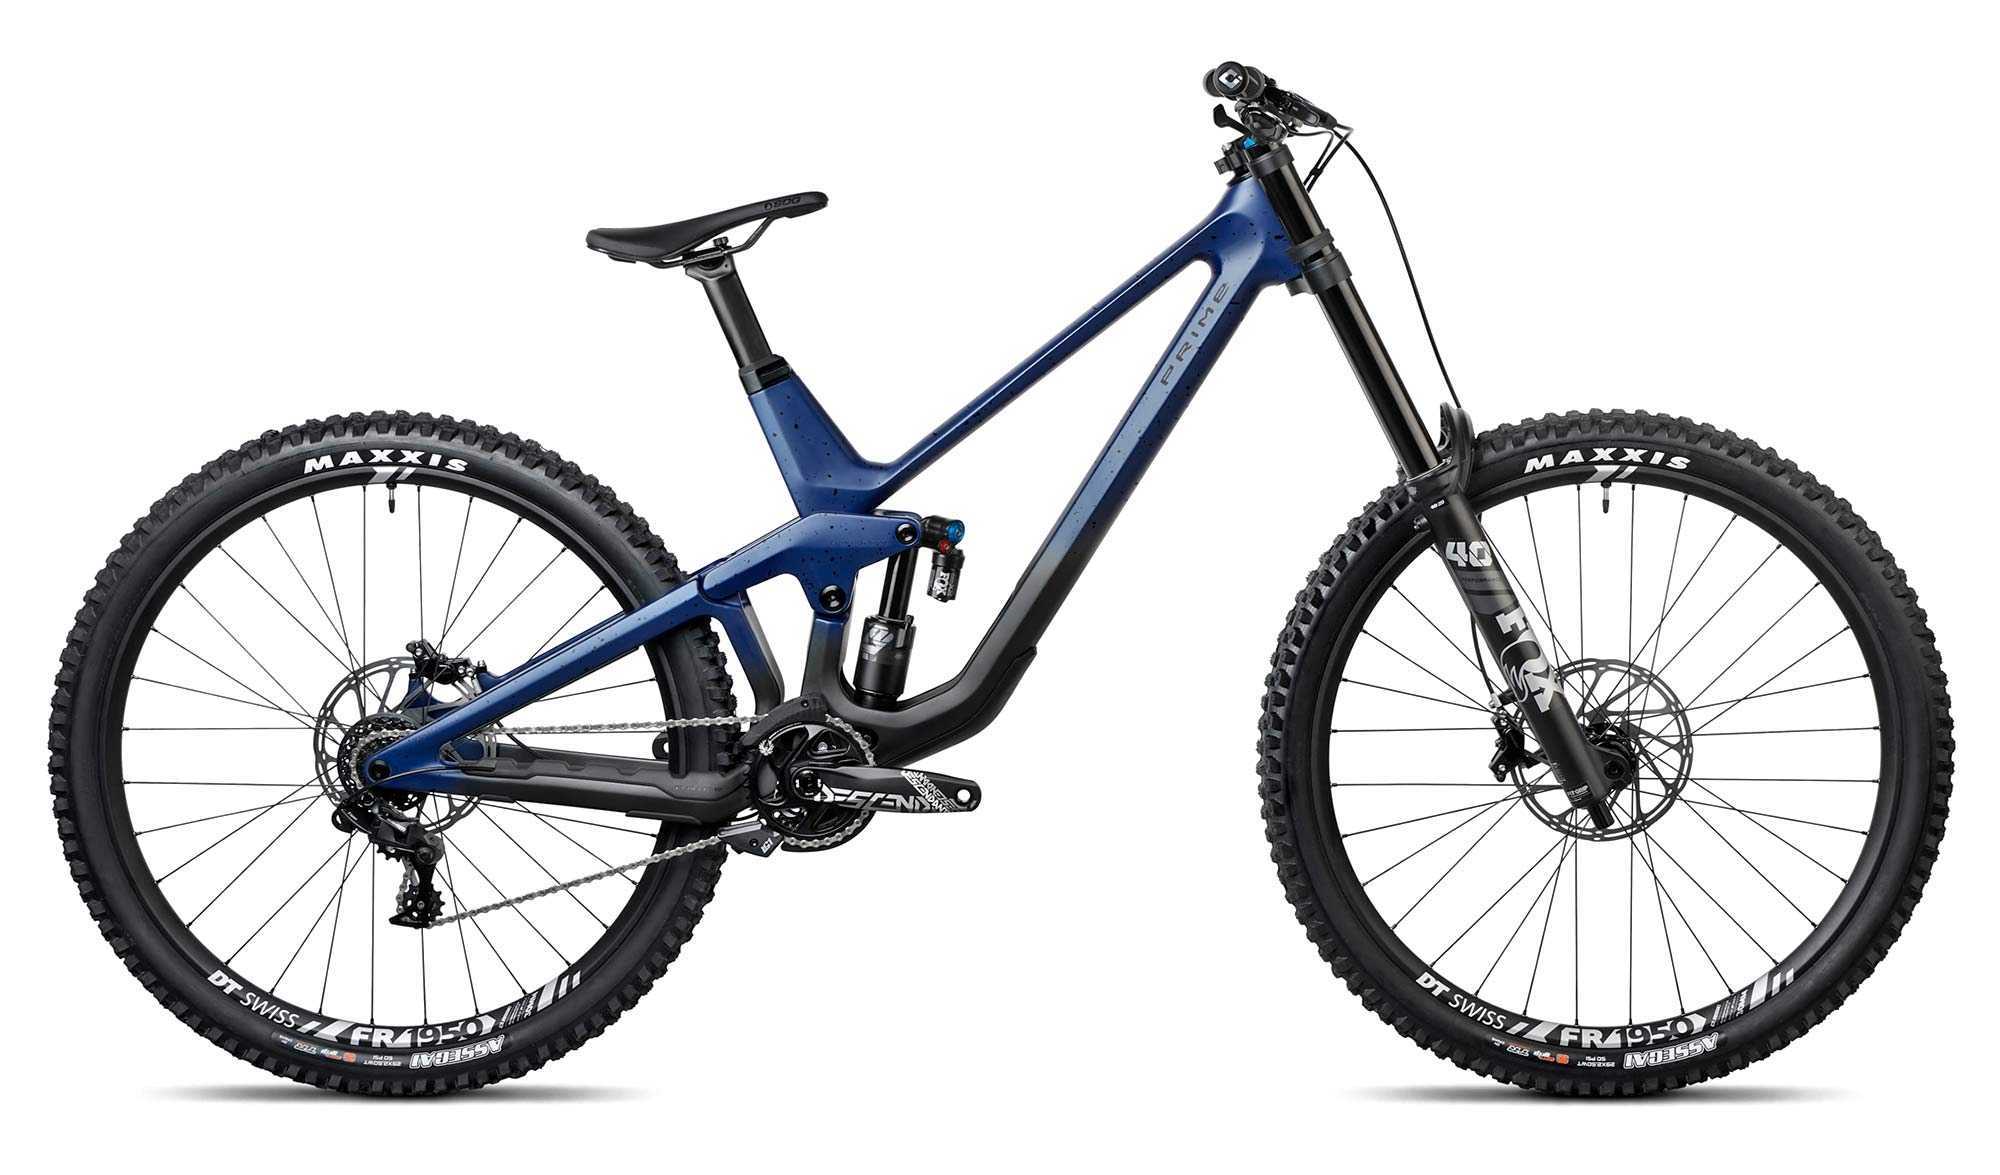 2021 Prime Rocket DH bike, affordable consumer-direct carbon 29er downhill mountain bike,C complete